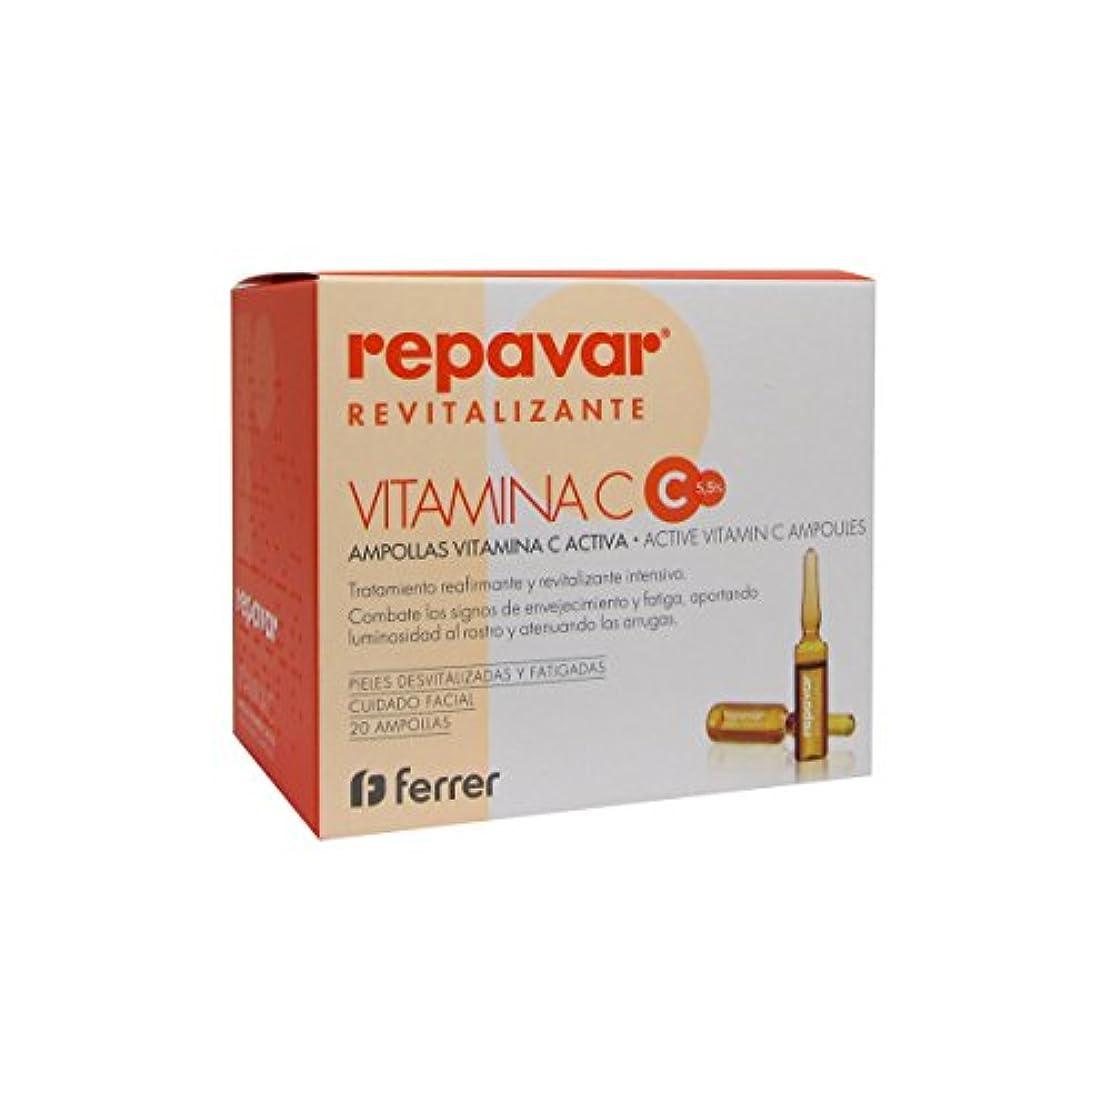 Repavar Revitalizing Vitamin C Ampoules X20 [並行輸入品]